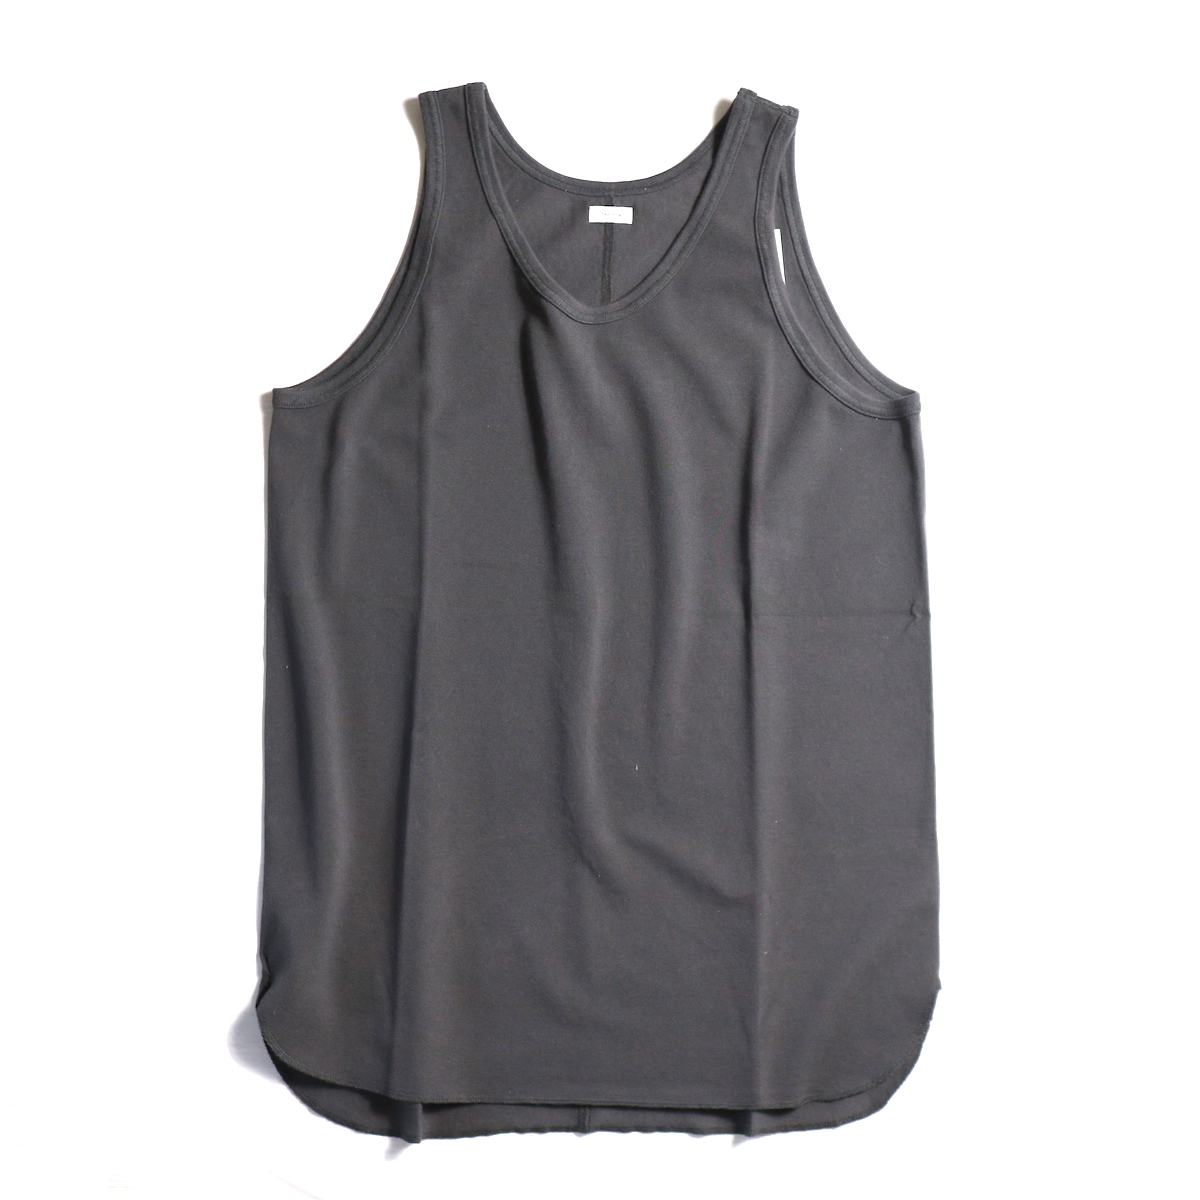 blurhms / Long Tank Top -Ash Charcoal